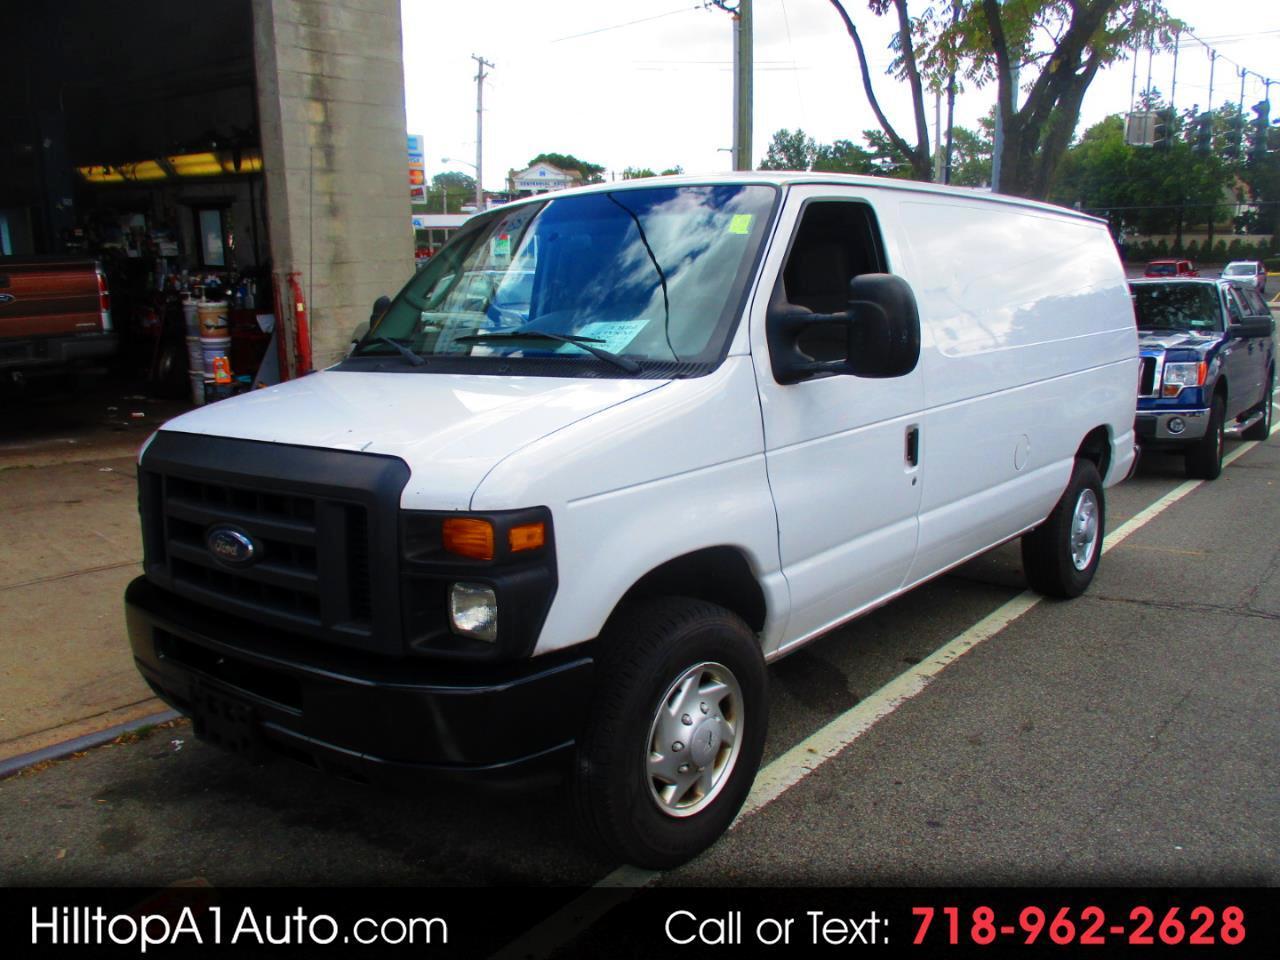 Ford Econoline Cargo Van E-250 Commercial 2013